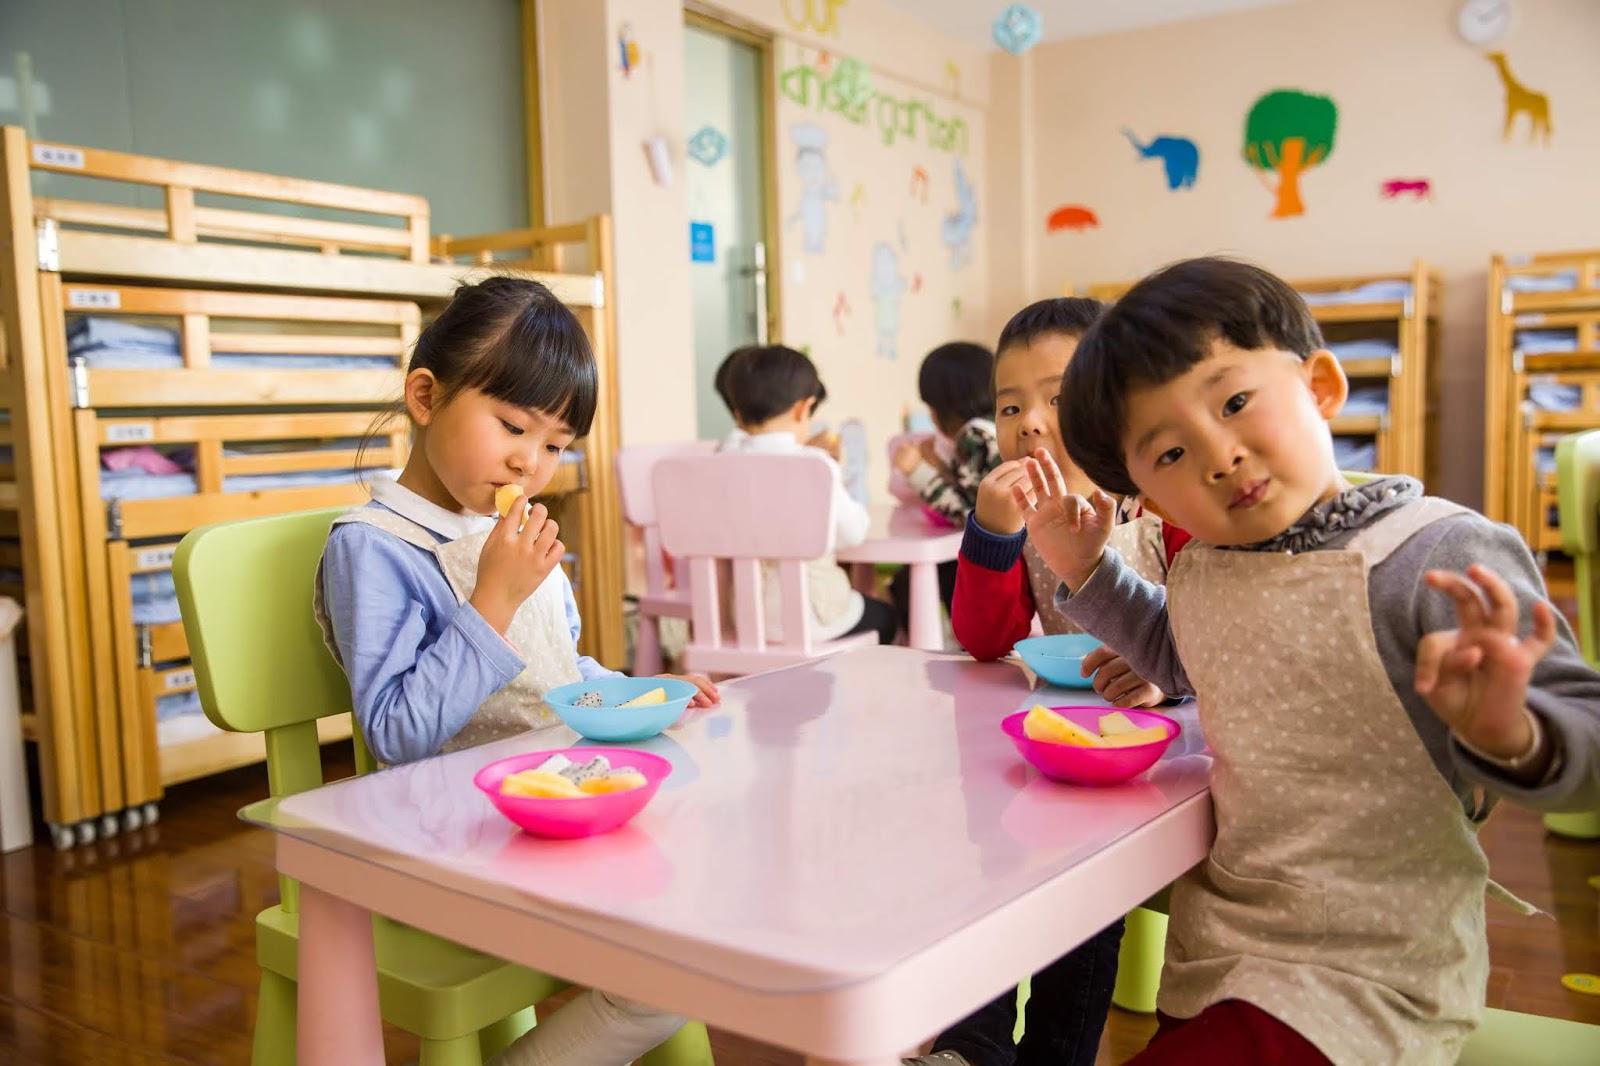 NAMC Montessori cosmic education and world food day. Children having snack.